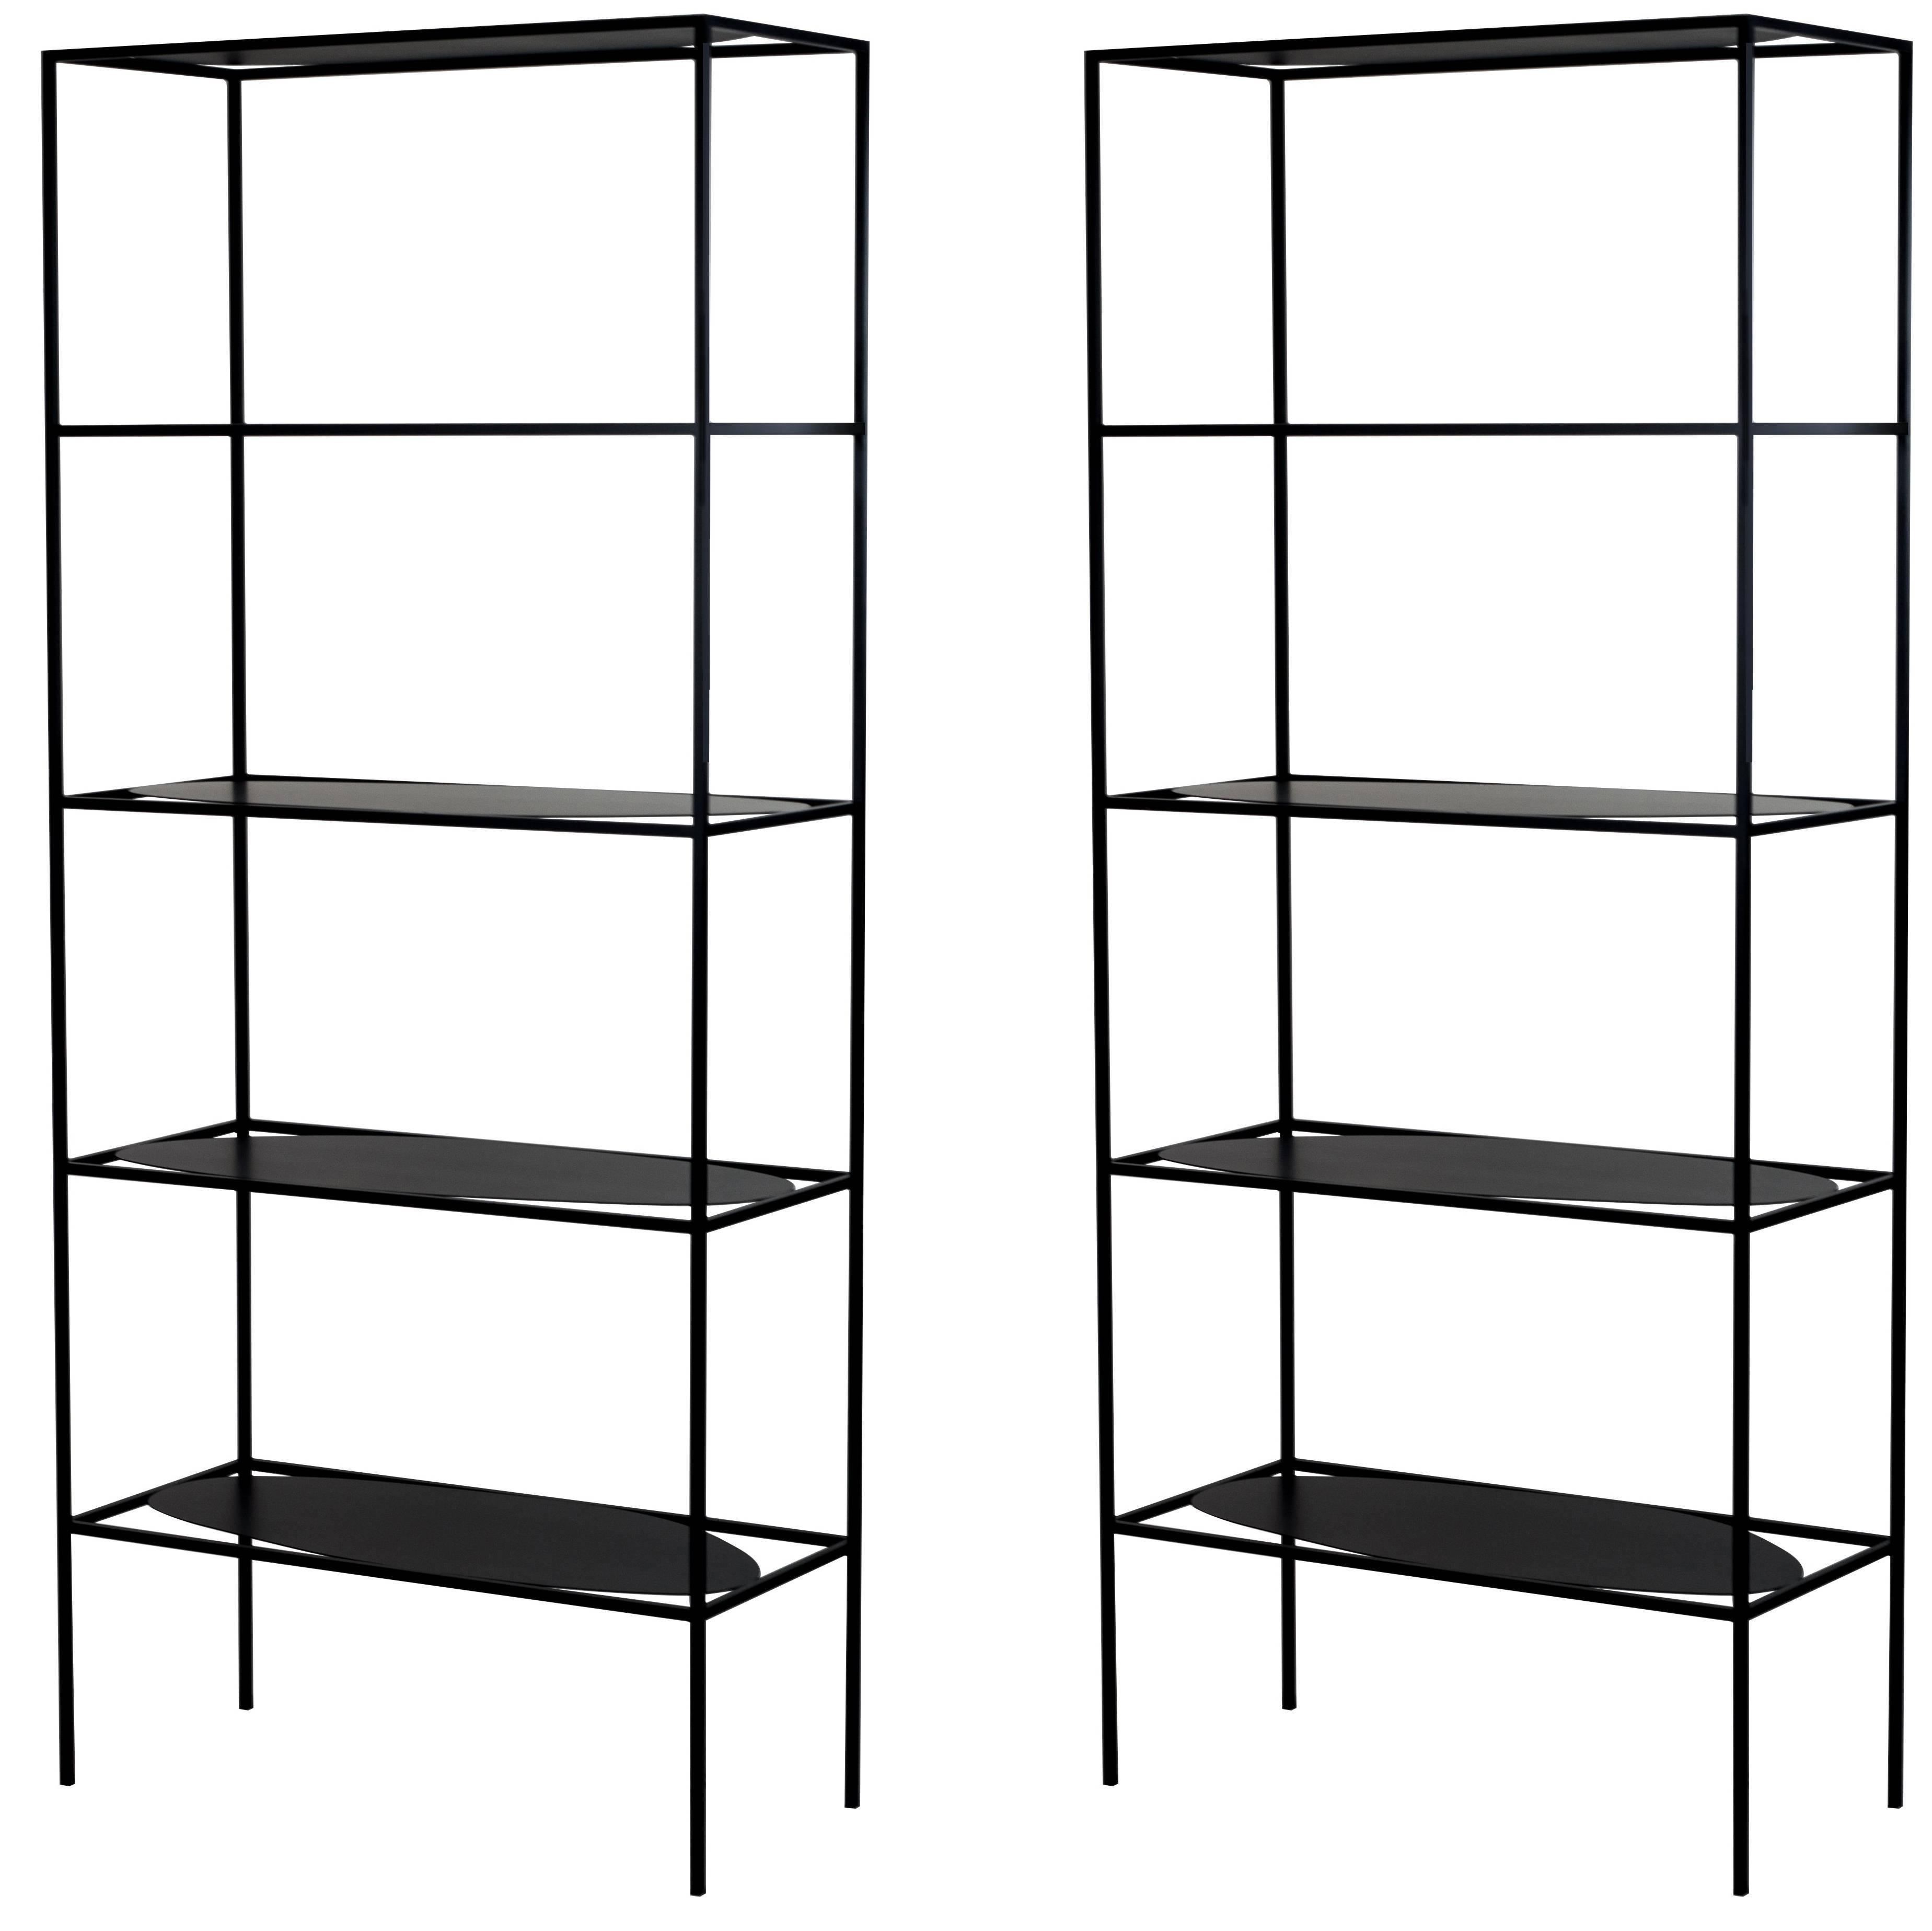 contemporary sculptural black steel etagere bookcase storage shelf rh 1stdibs com modern wall storage shelves modern wall storage shelves